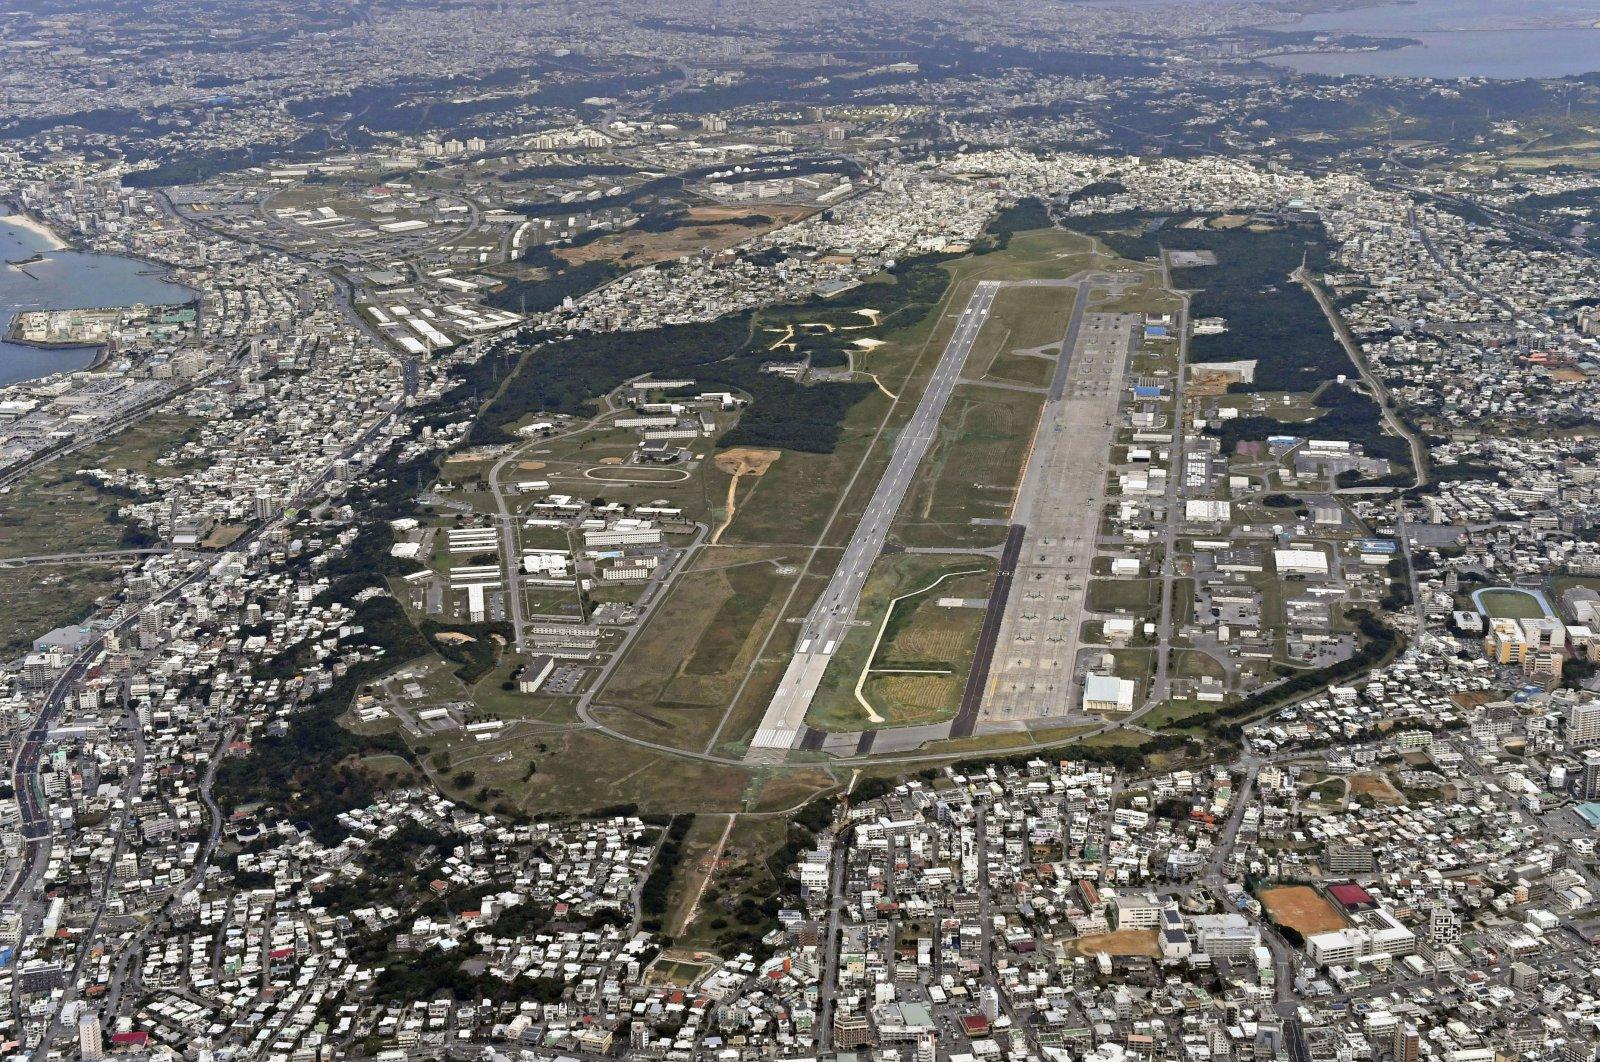 This aerial file photo shows U.S. Marine Air Station Futenma in Ginowan, Okinawa, southern Japan, Jan. 27, 2018. (Kyodo News via AP)